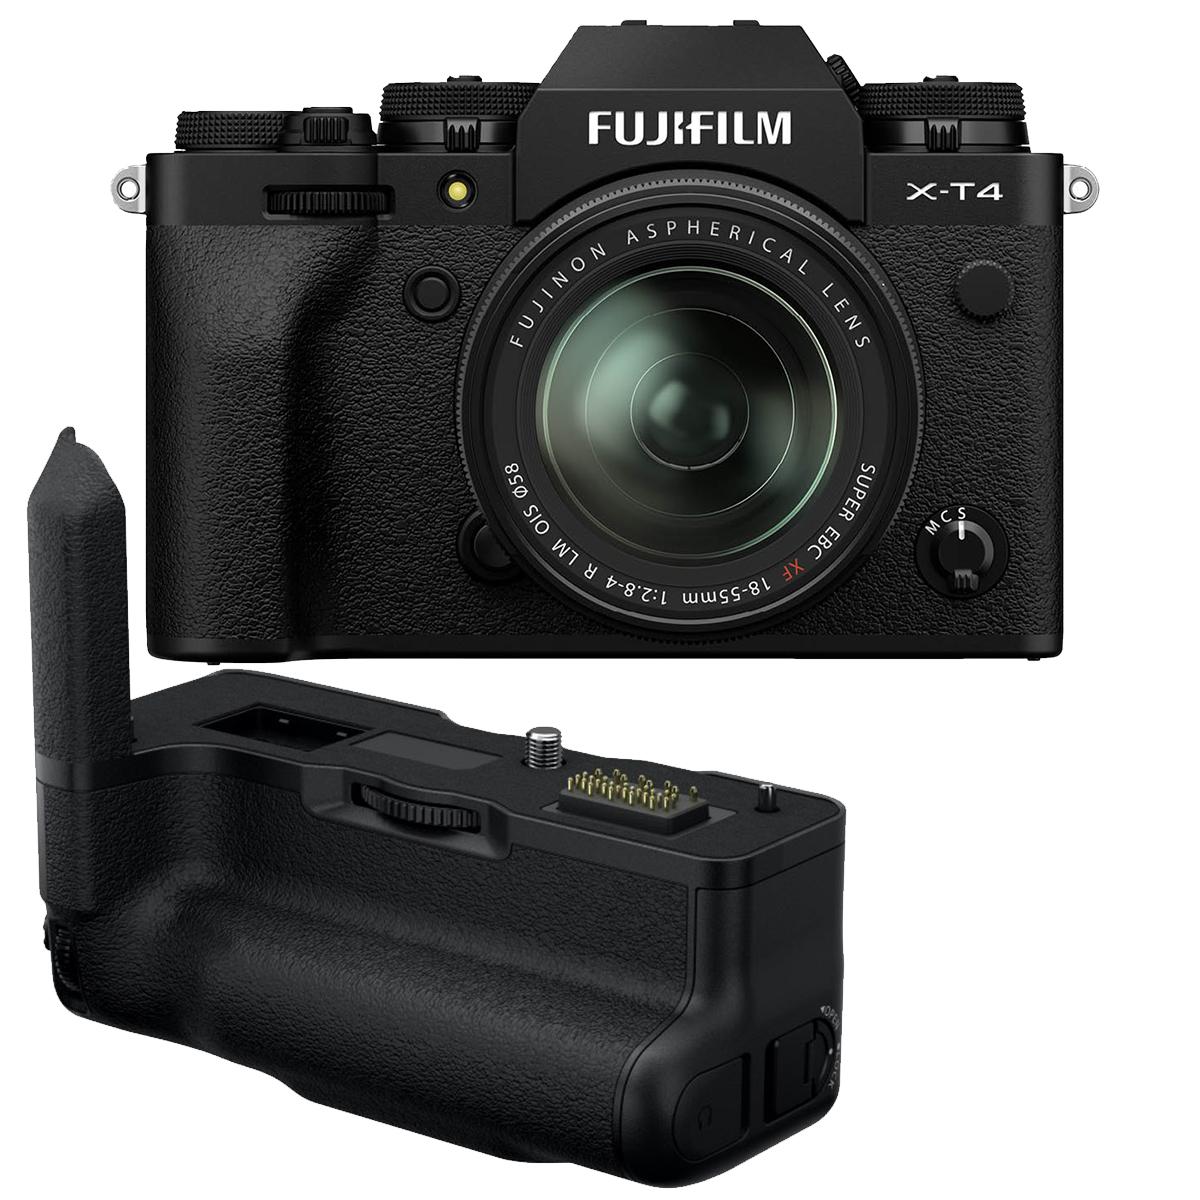 Fujifilm X-T4 Kit mit 18-55 mm 1:2,8-4 + VG-XT4 Handgriff